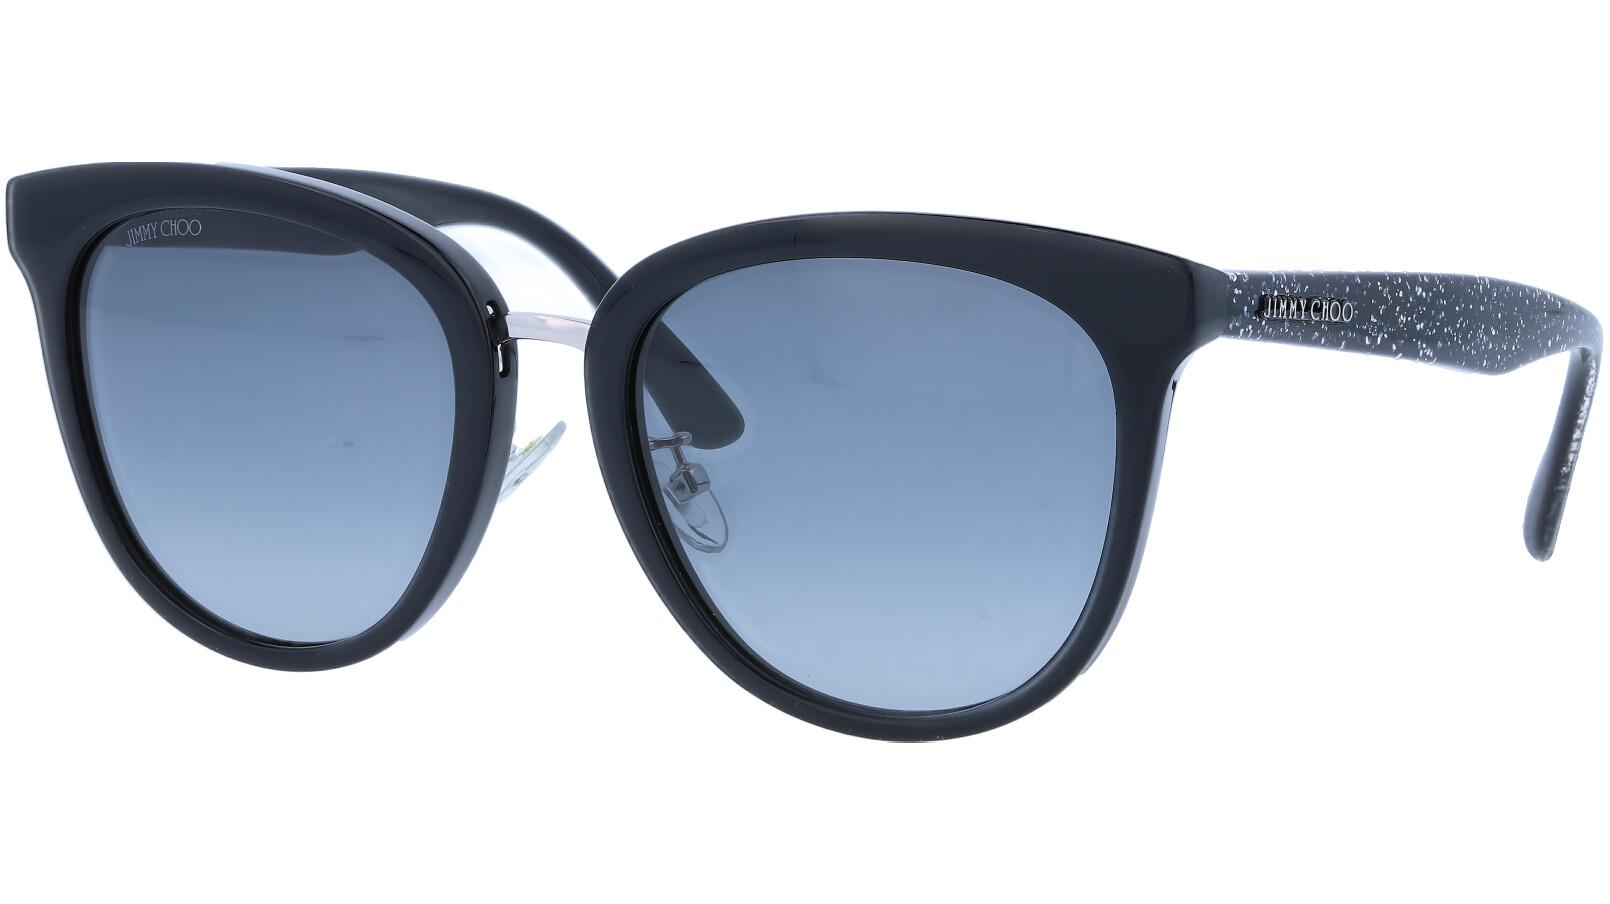 JIMMY CHOO CADEFS NS890 BLACK Sunglasses